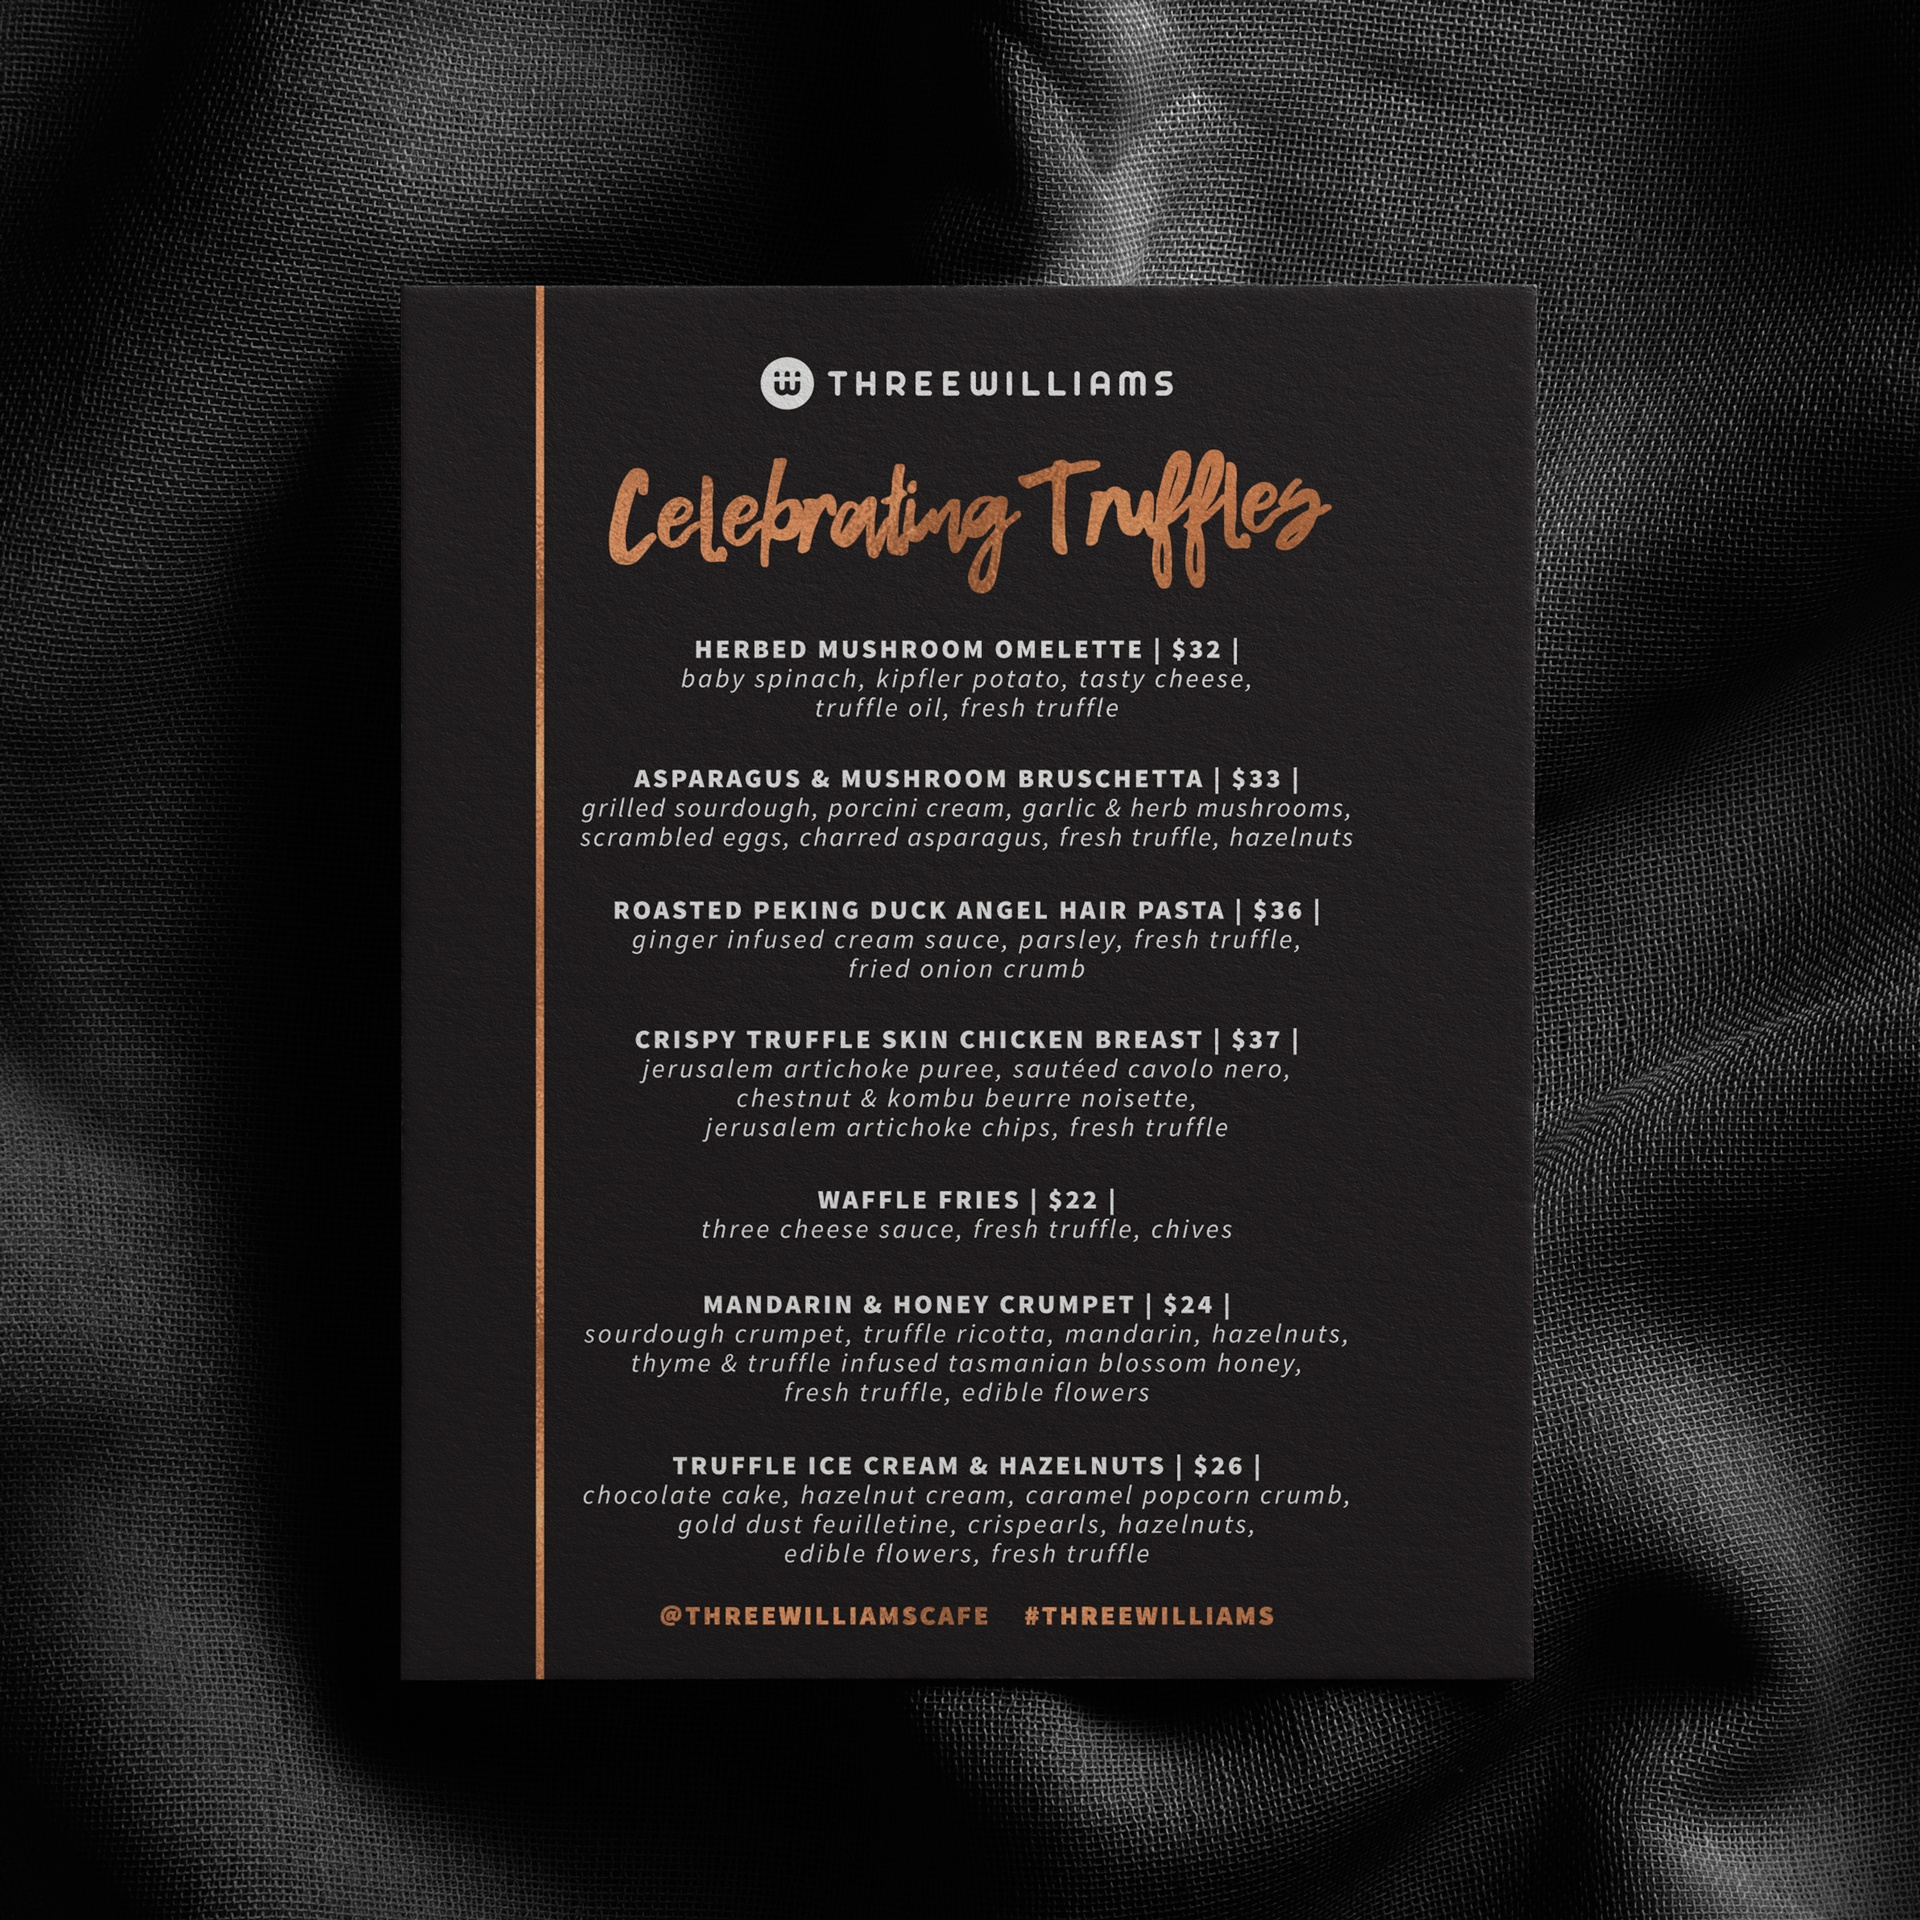 sydney-design-social-three-williams-redfern-celebrating-truffles-menu